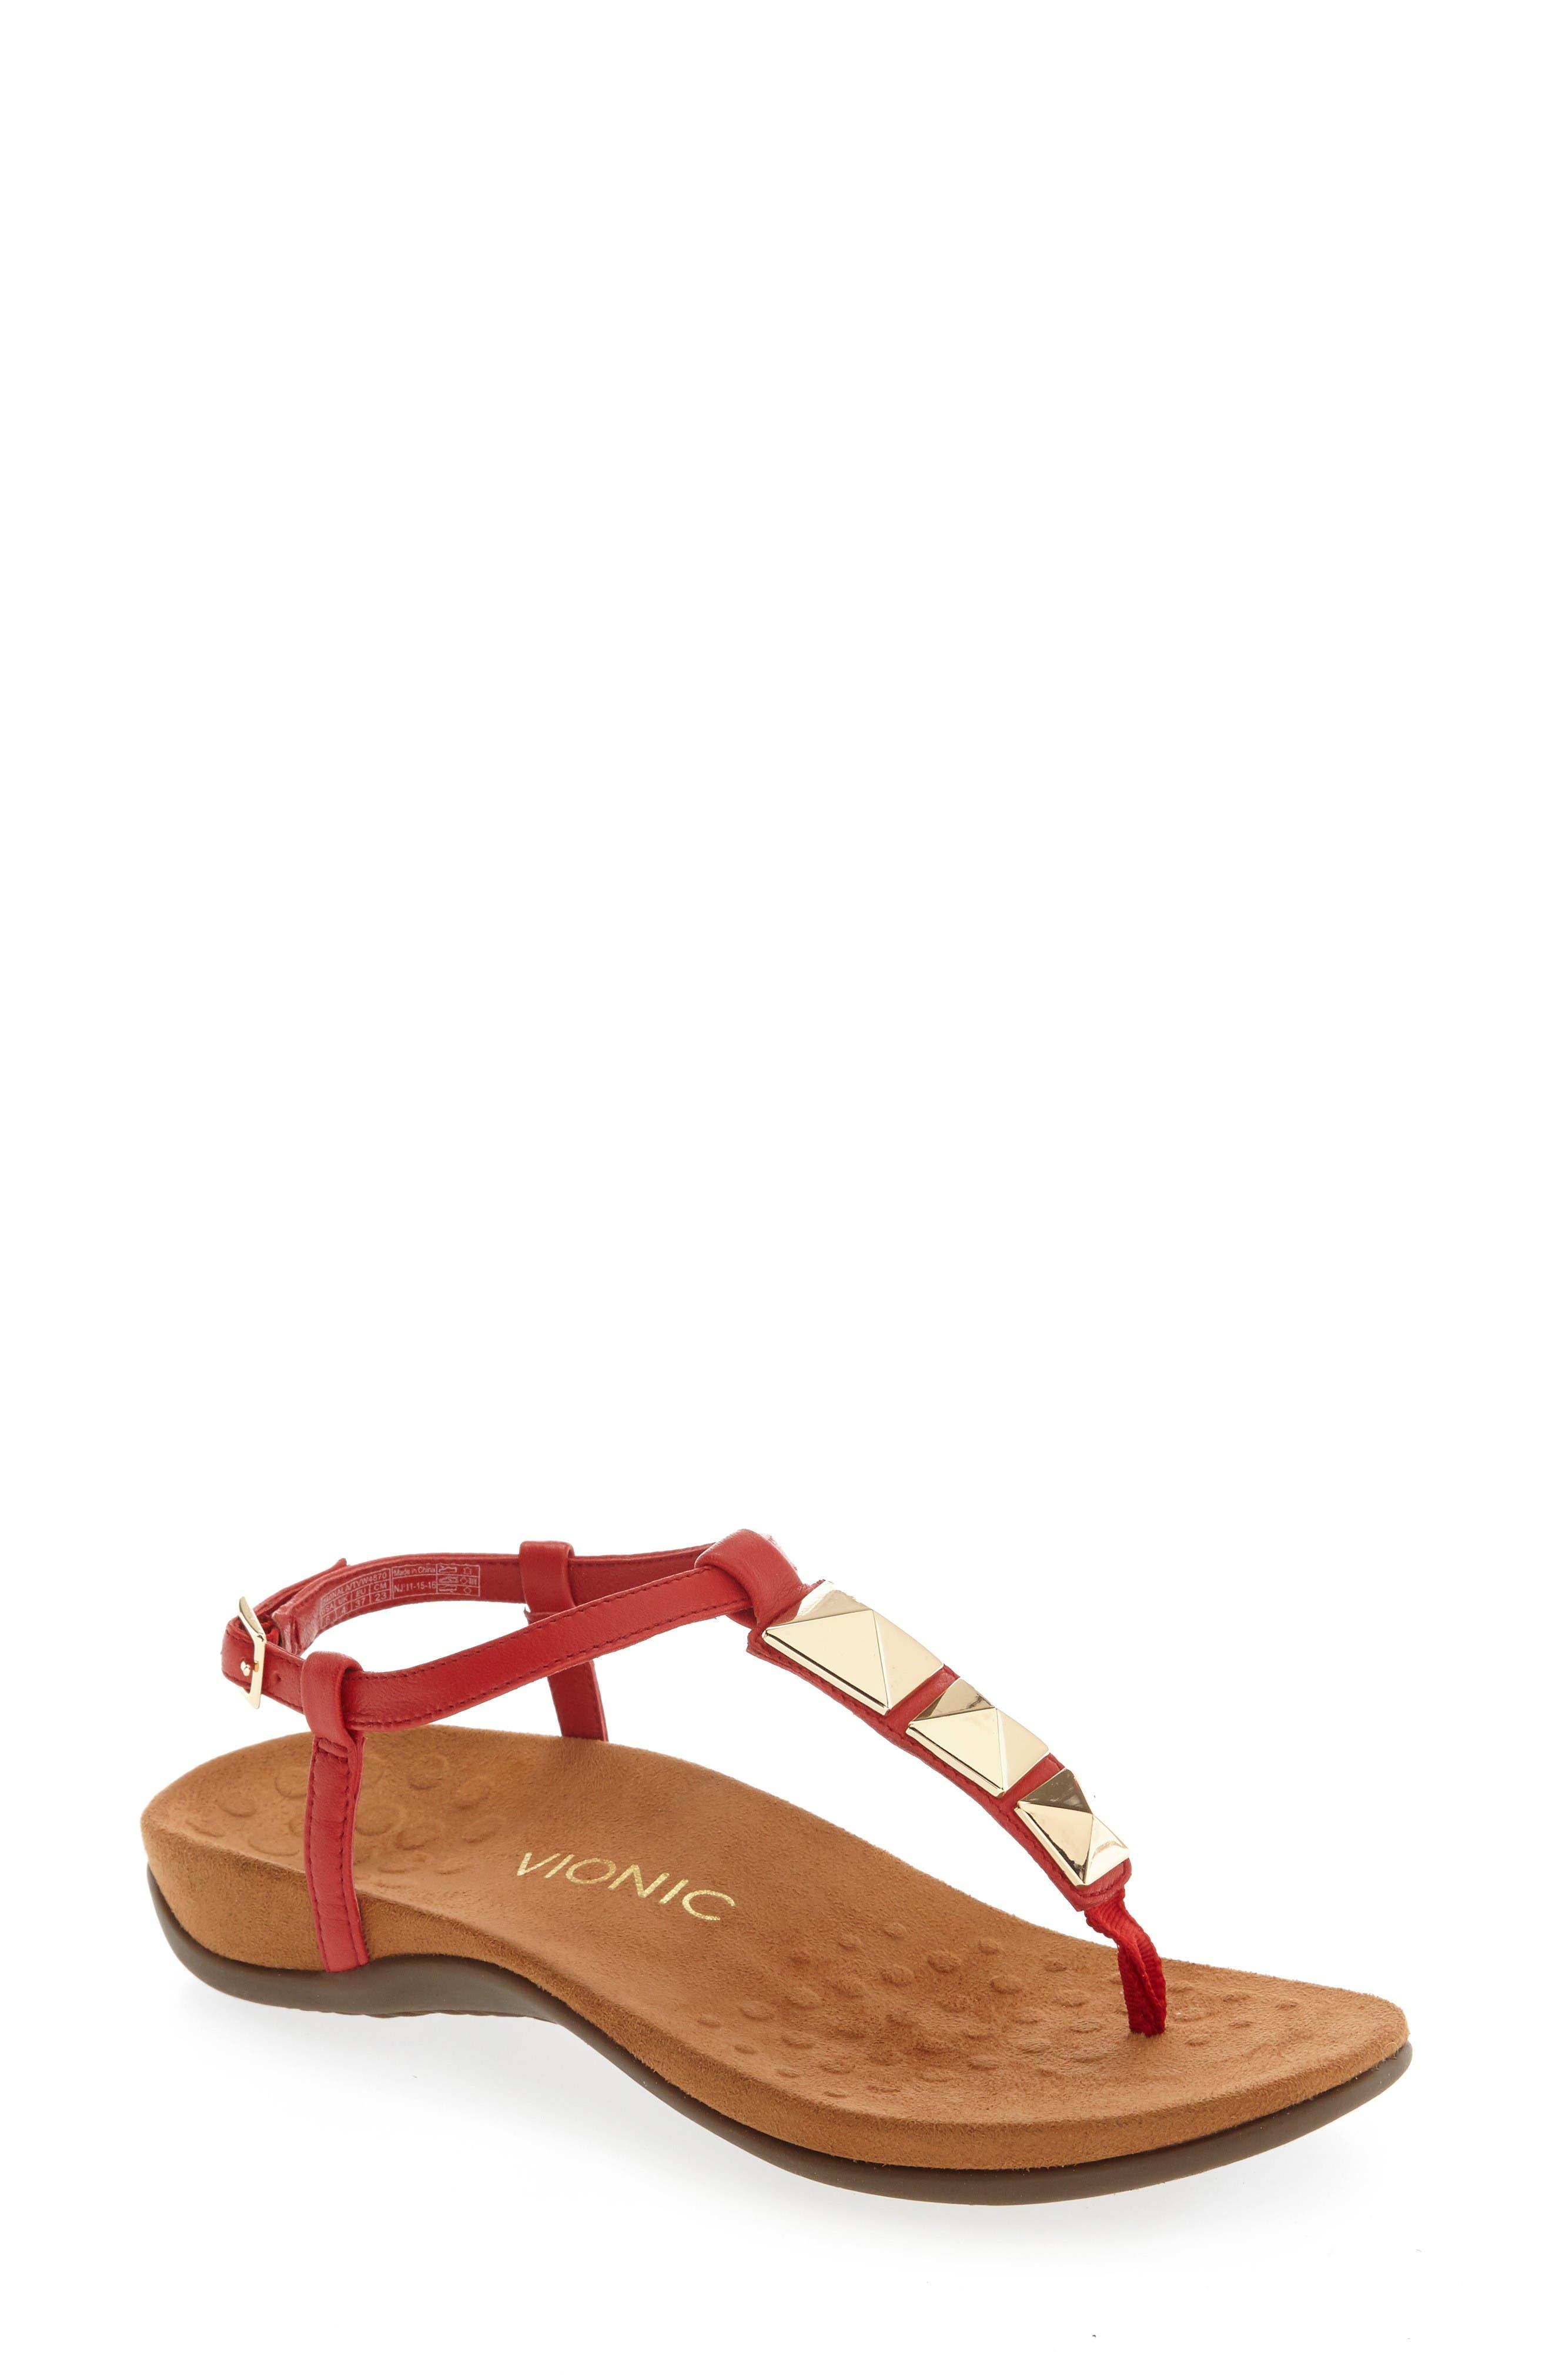 Alternate Image 1 Selected - Vionic Nala T-Strap Sandal (Women)